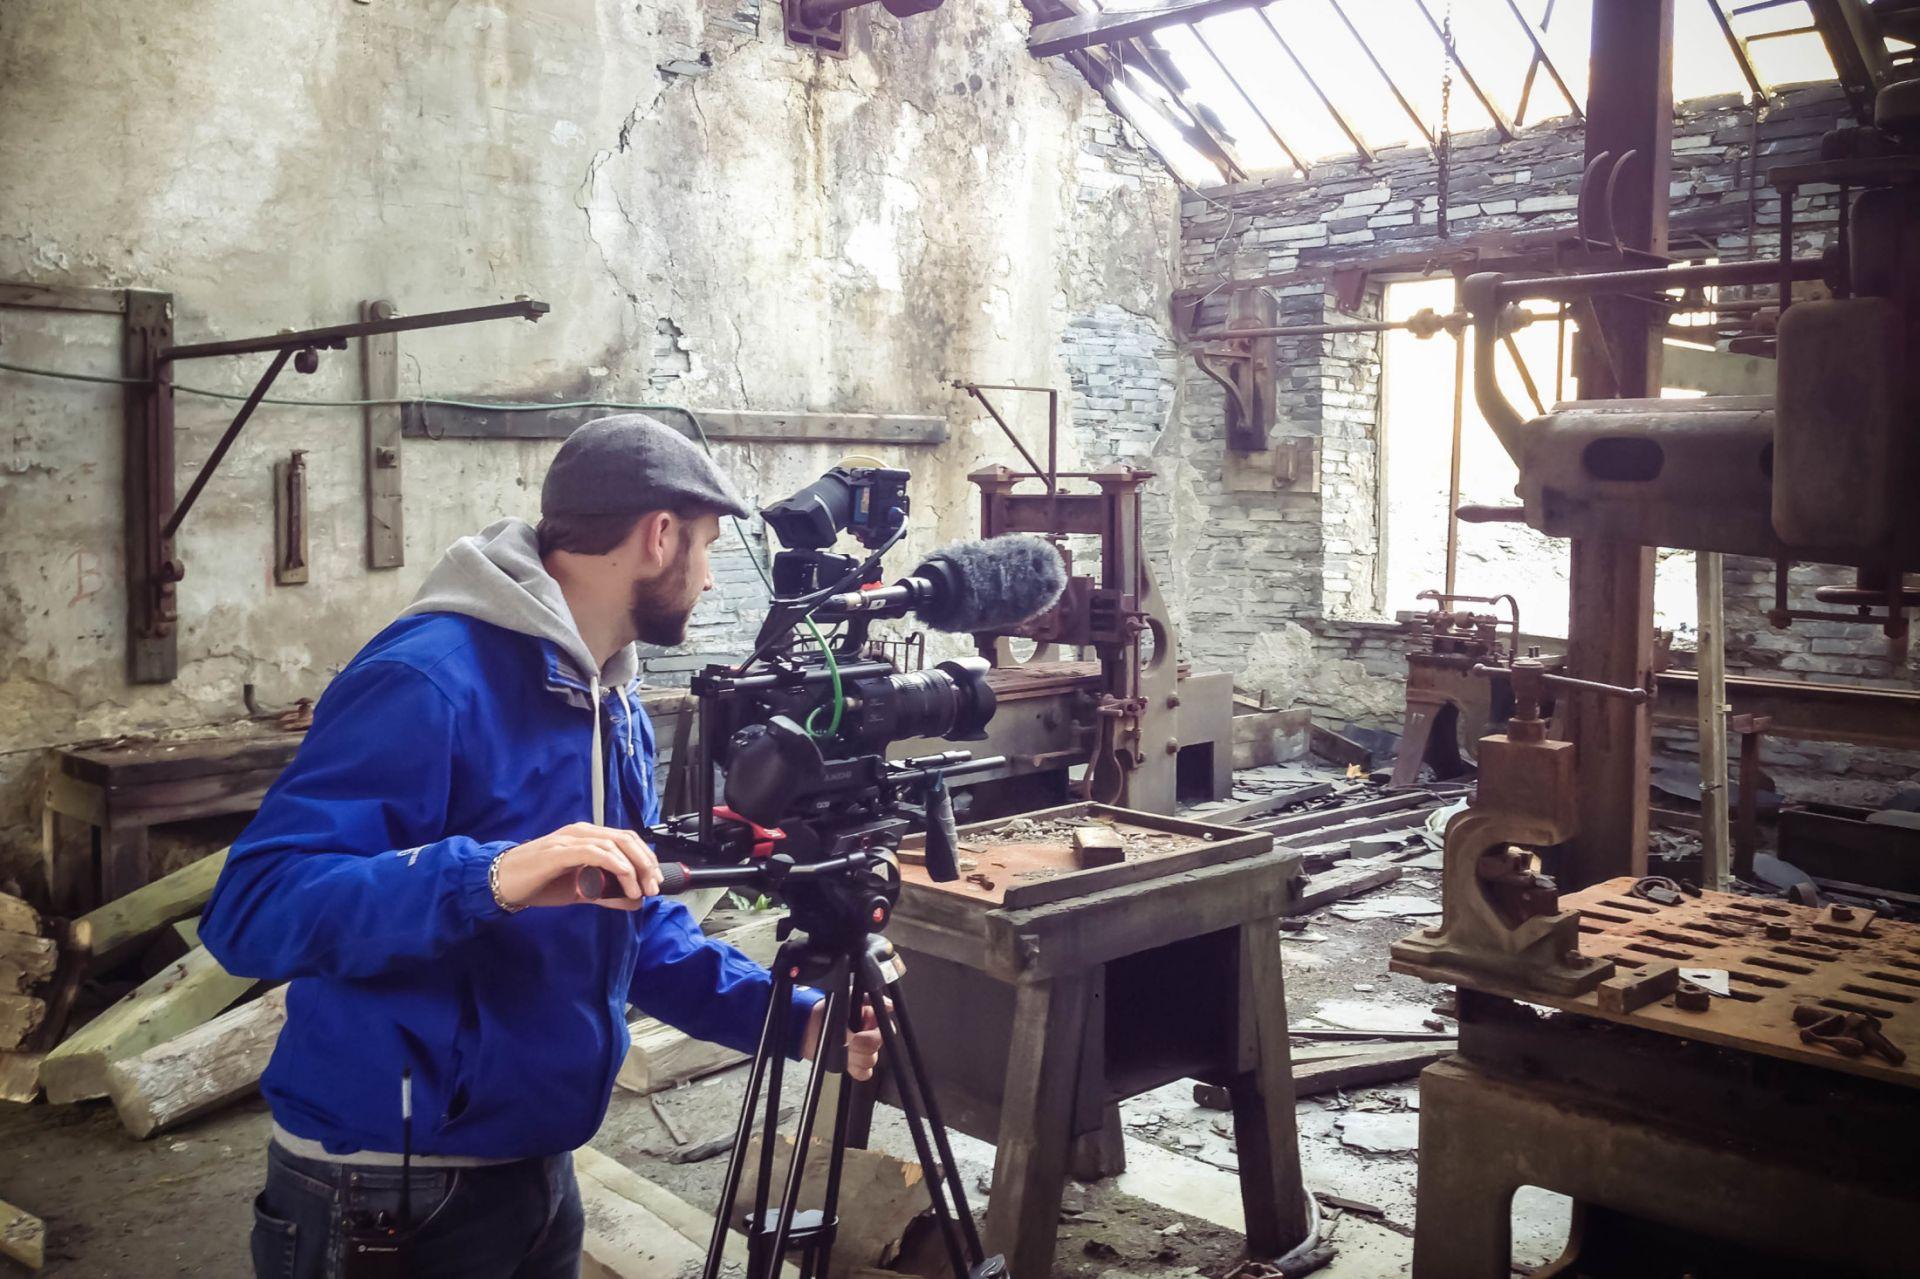 Cameraman filming in warehouse